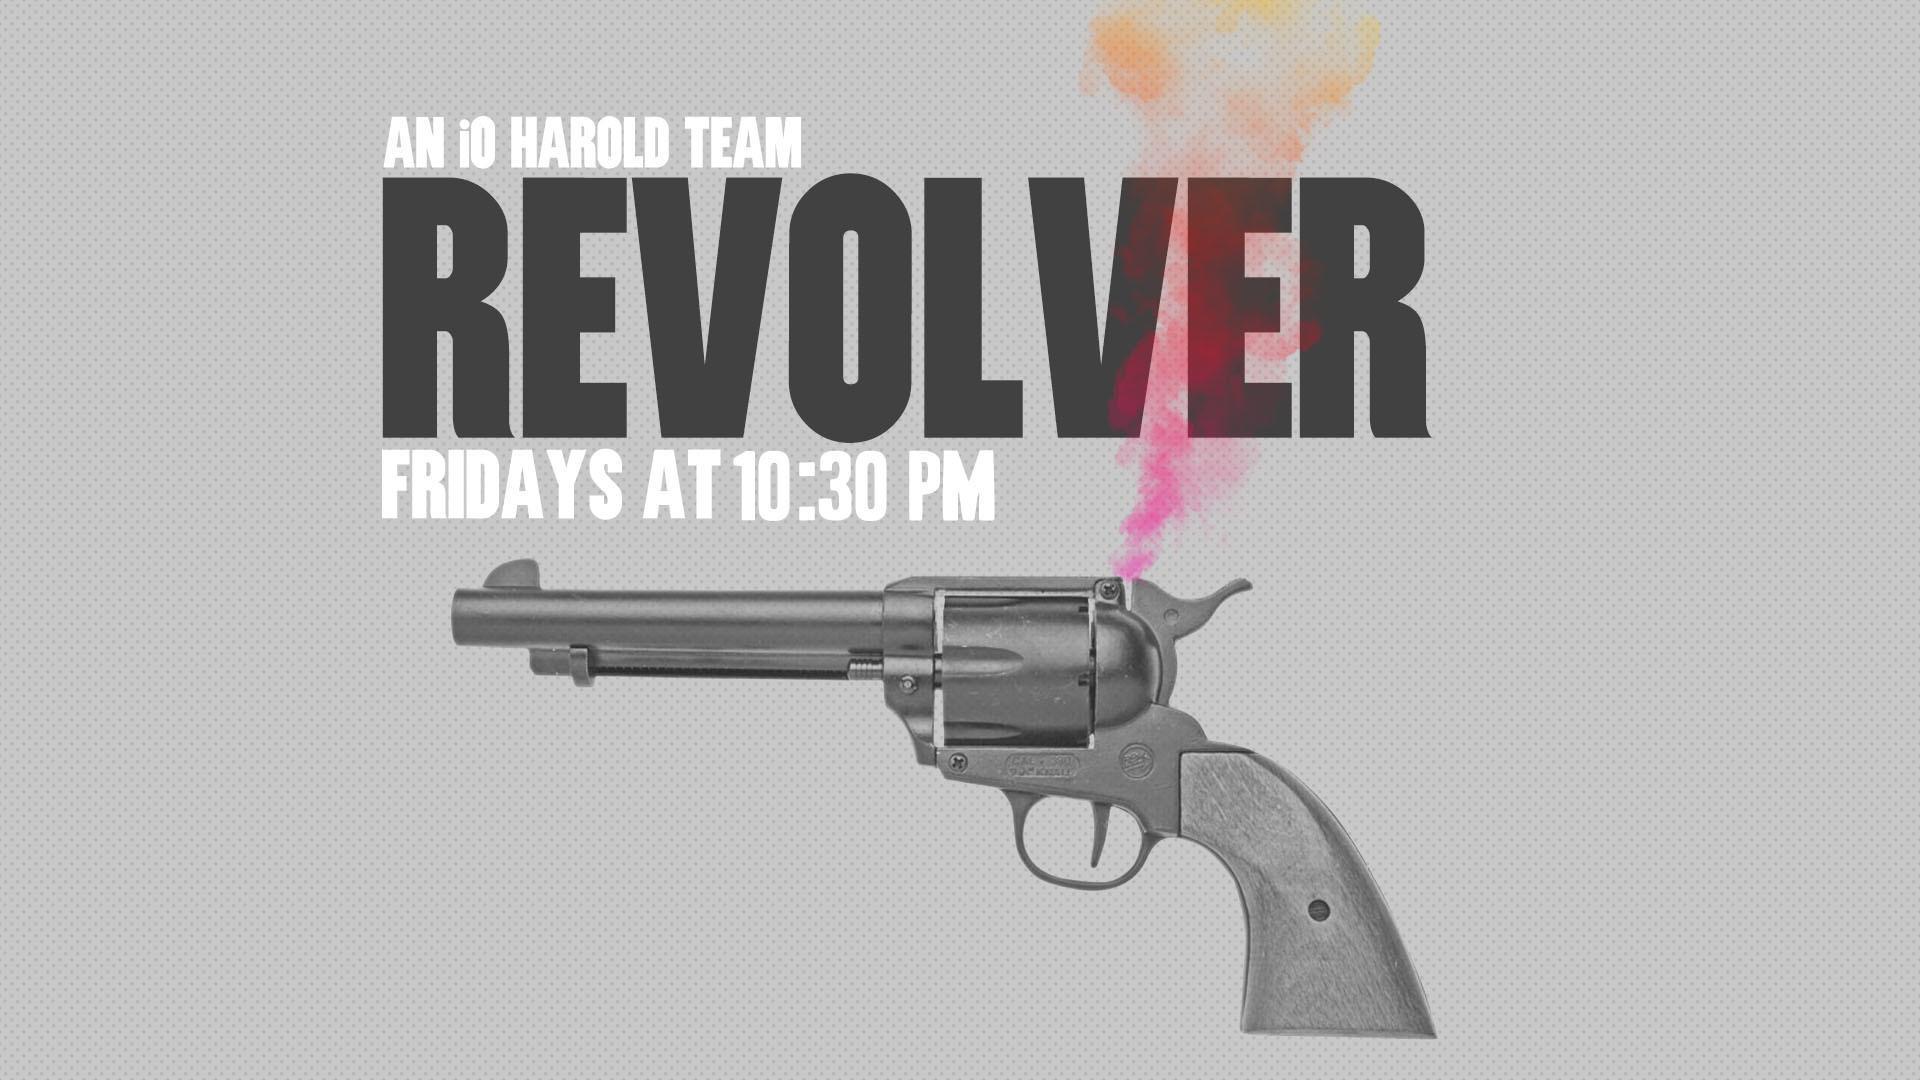 HAROLD NIGHT w/ Revolver & Nectar